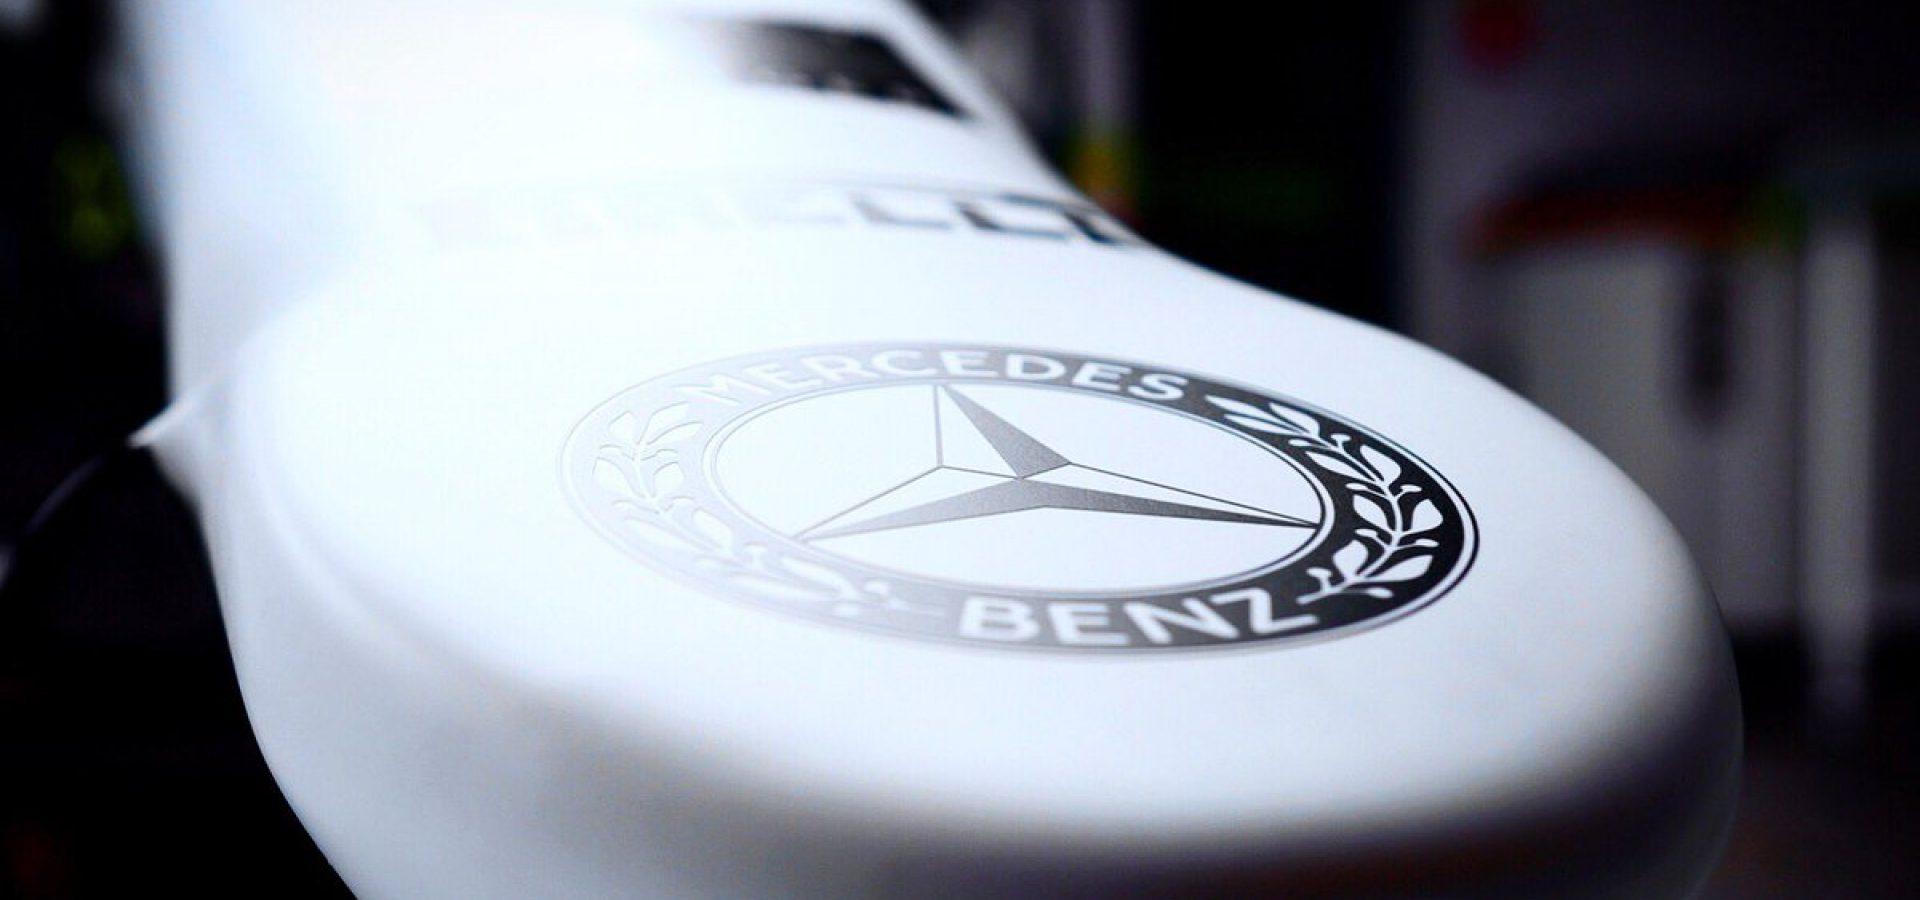 Mercedes heritage logo, Hockenheim, Mercedes nose